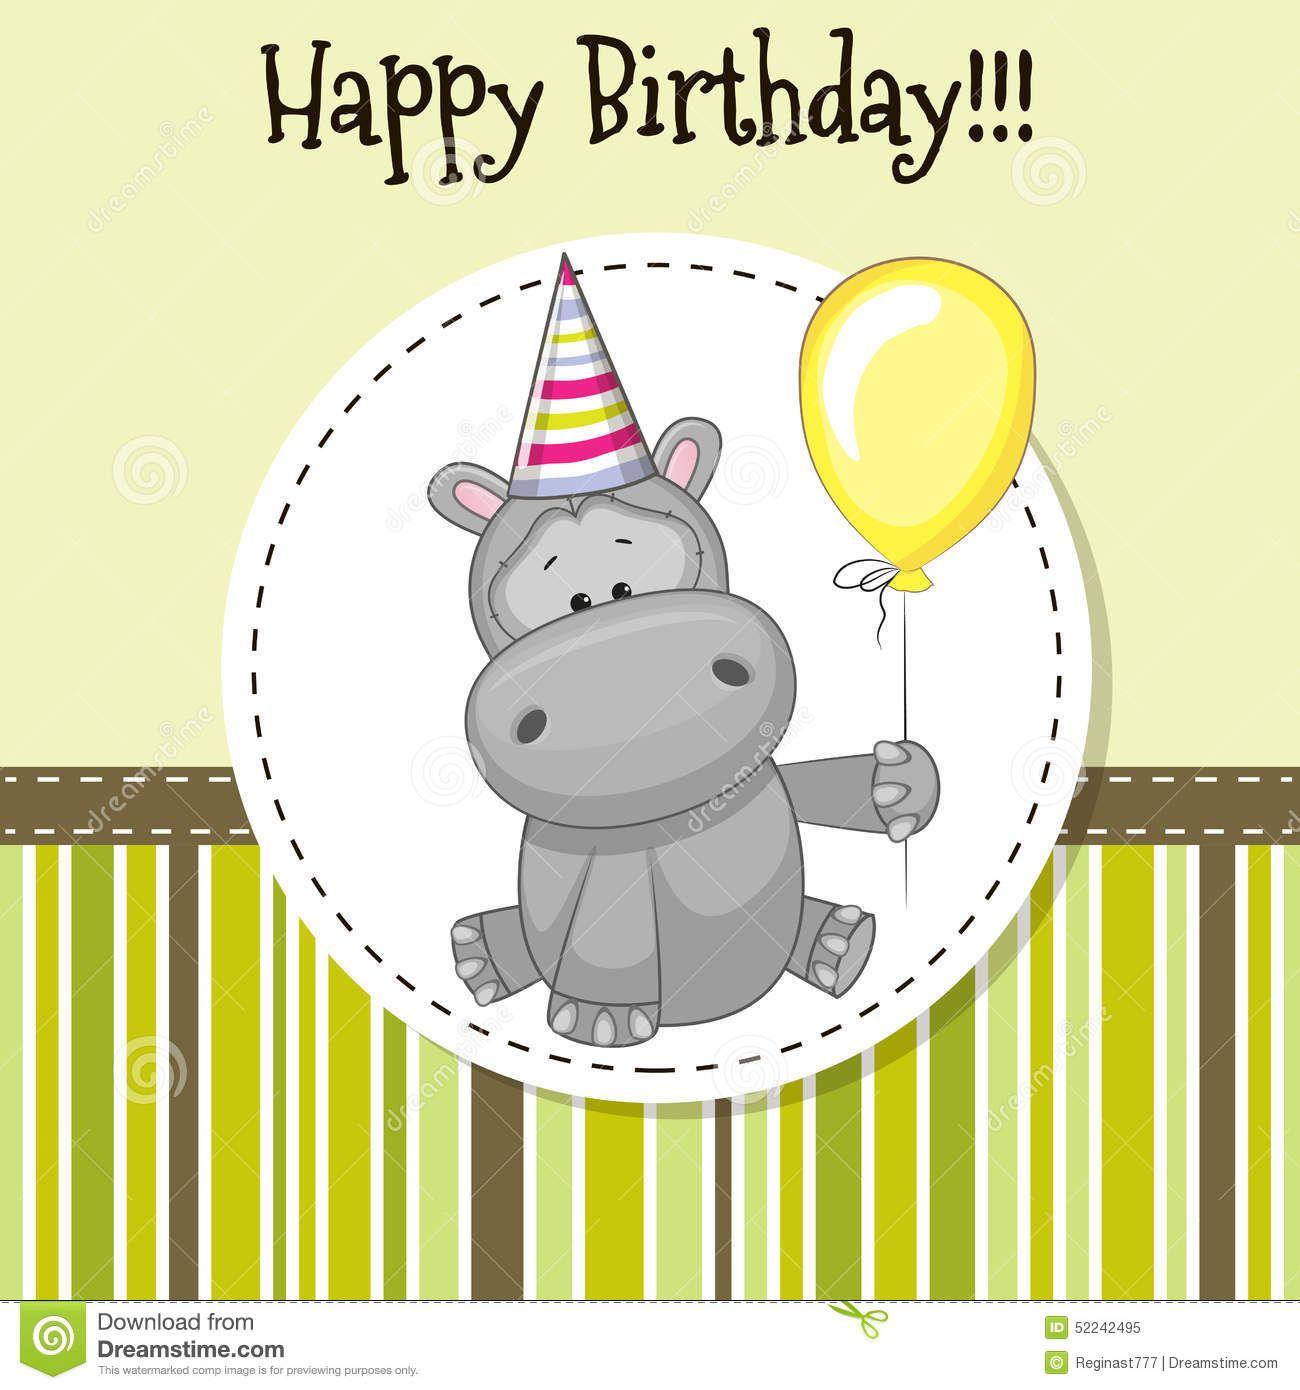 Hippo With Balloon Stock Vector Illustration Of Design 52242495 Happy Birthday Kind Alles Gute Zum Geburtstag Fotos Grußkarten Geburtstag